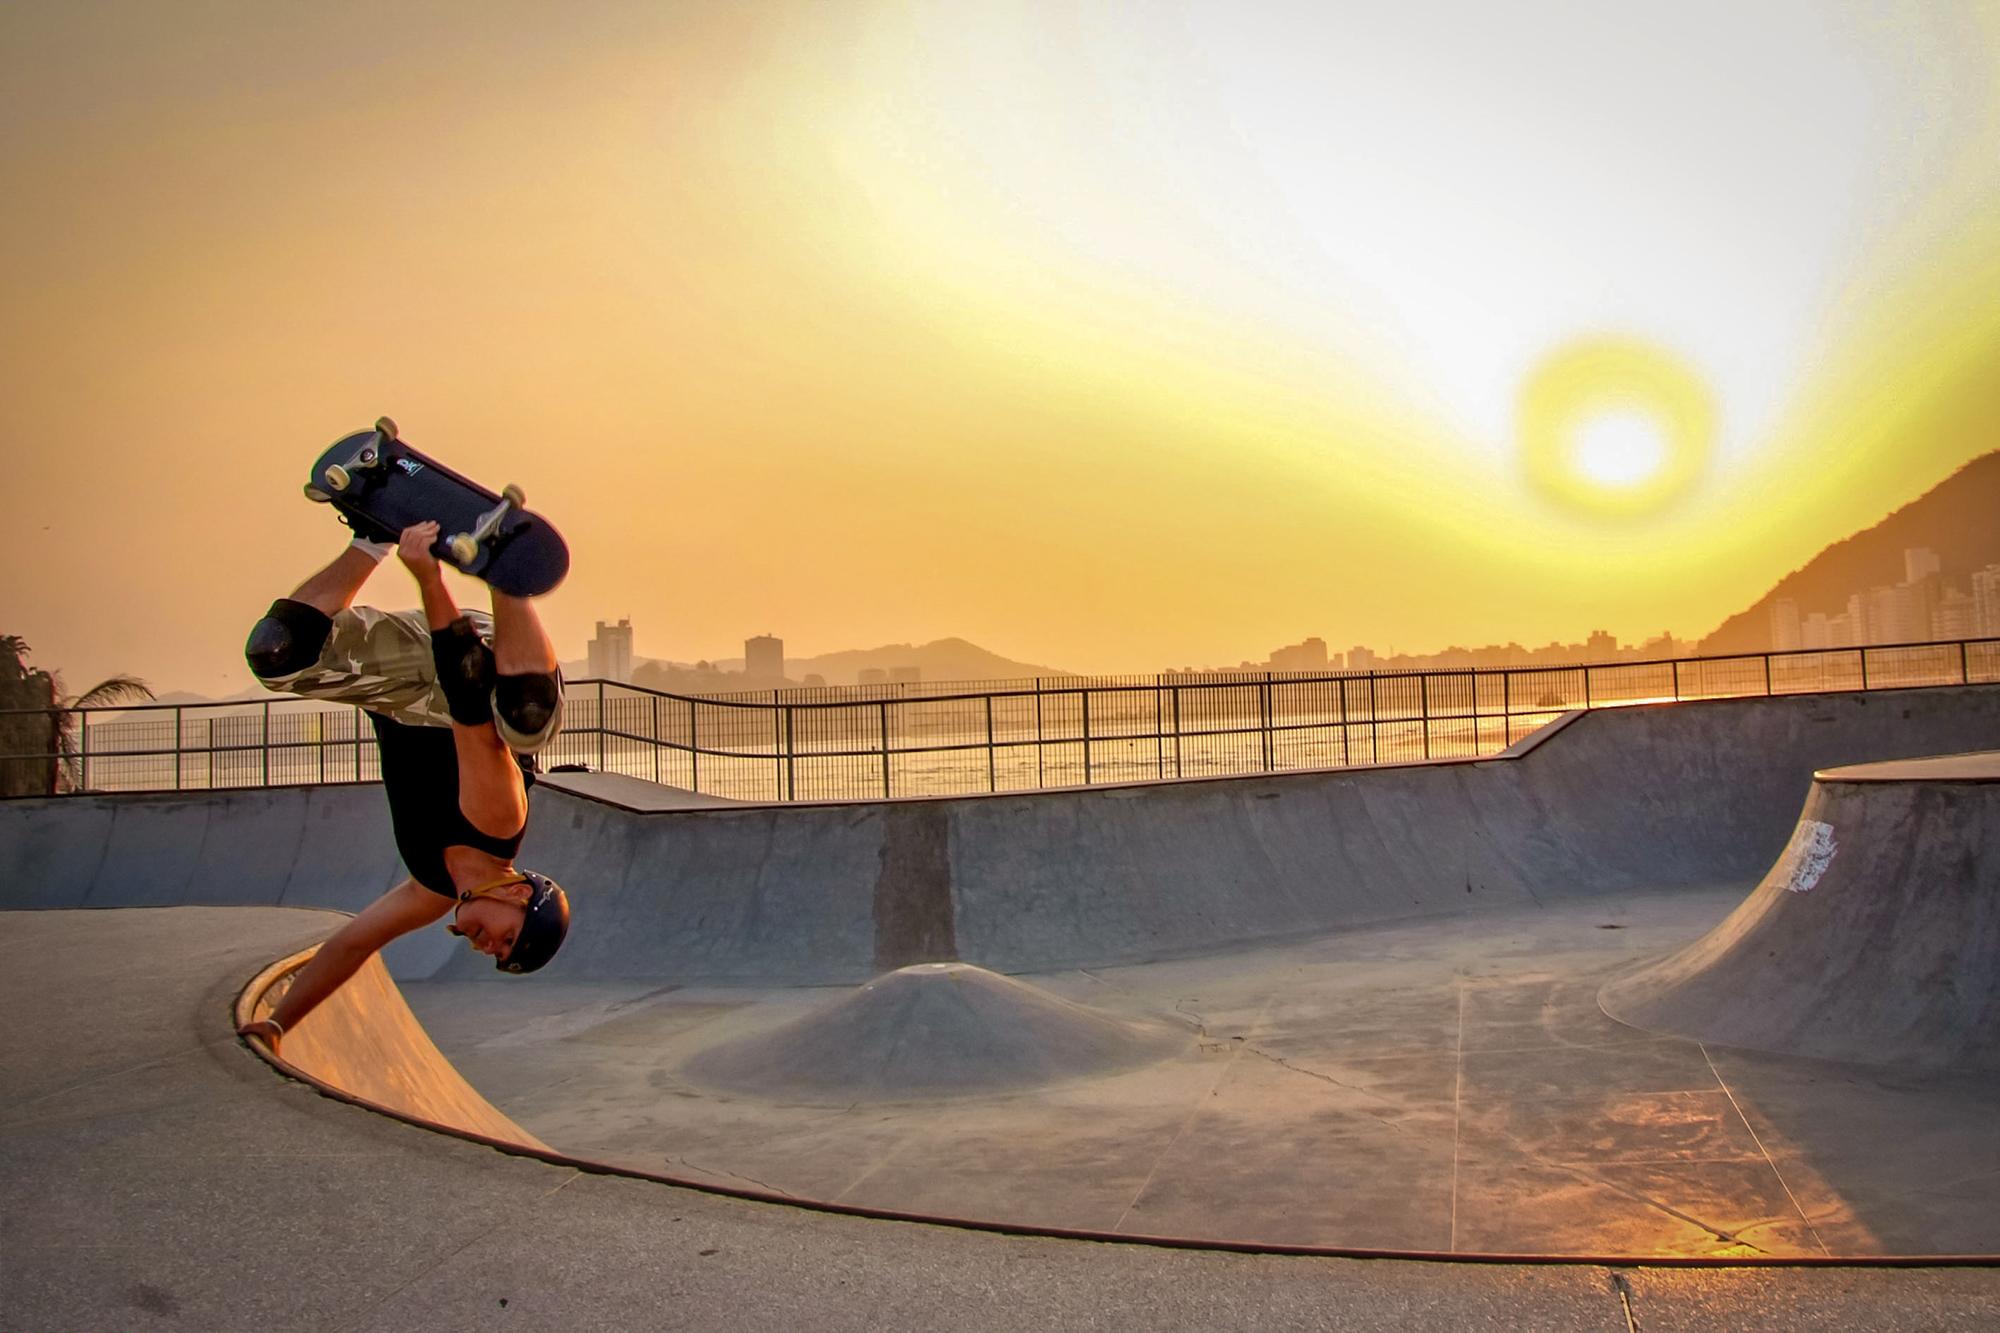 skateboard ramp trick park sunset flip